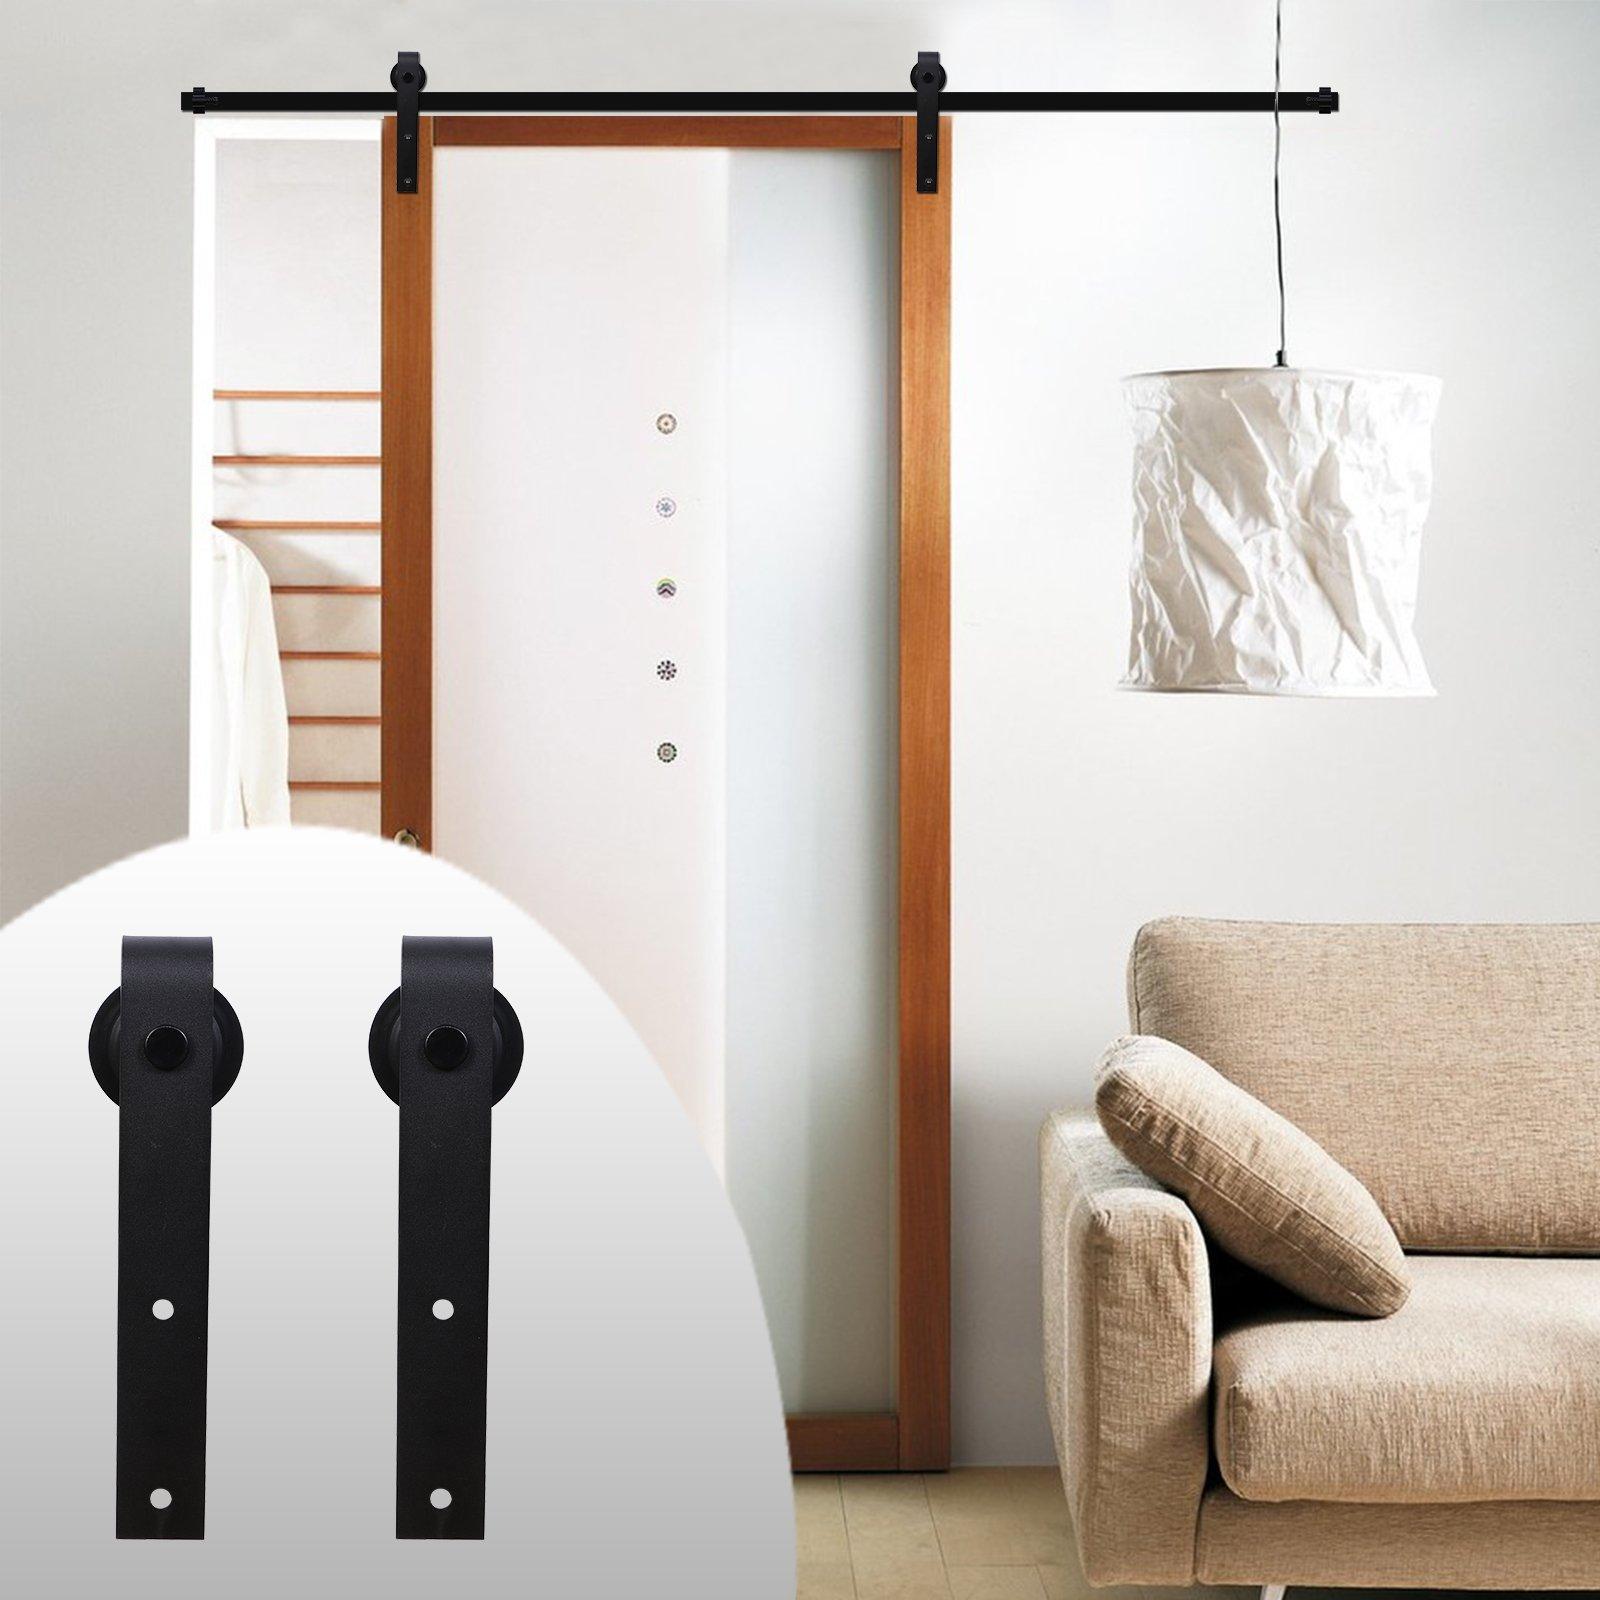 LWZH American Style 4FT Sliding Wood Barn Door Steel Hardware Kit for Single Door(Black J Shaped Hangers)